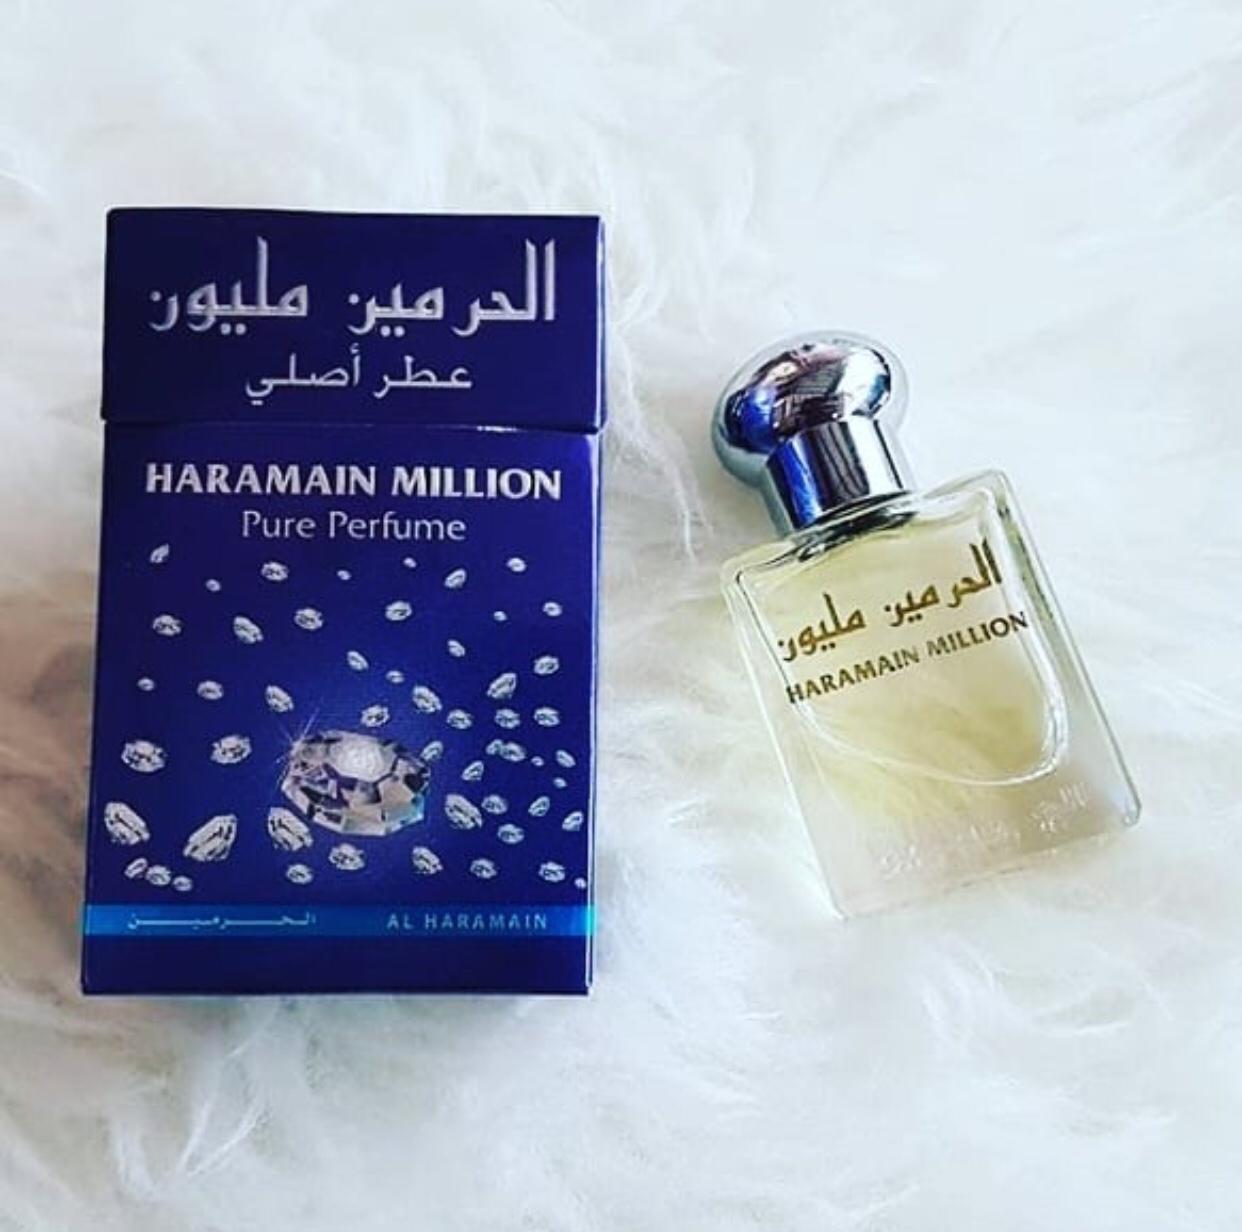 Al Haramain - Million